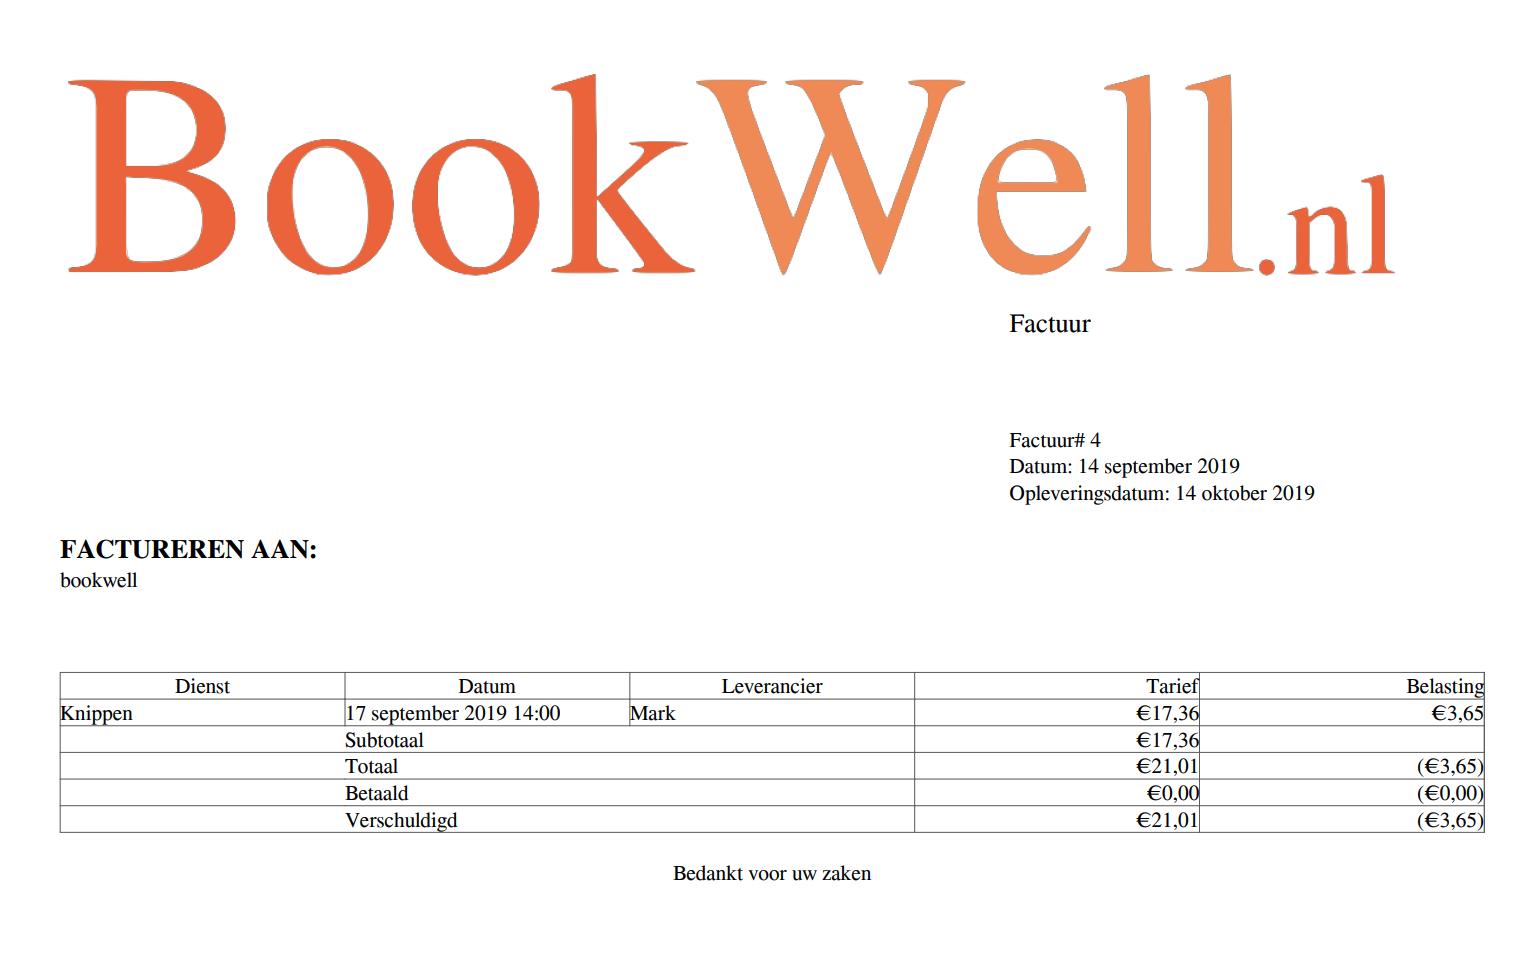 bookwell factuur